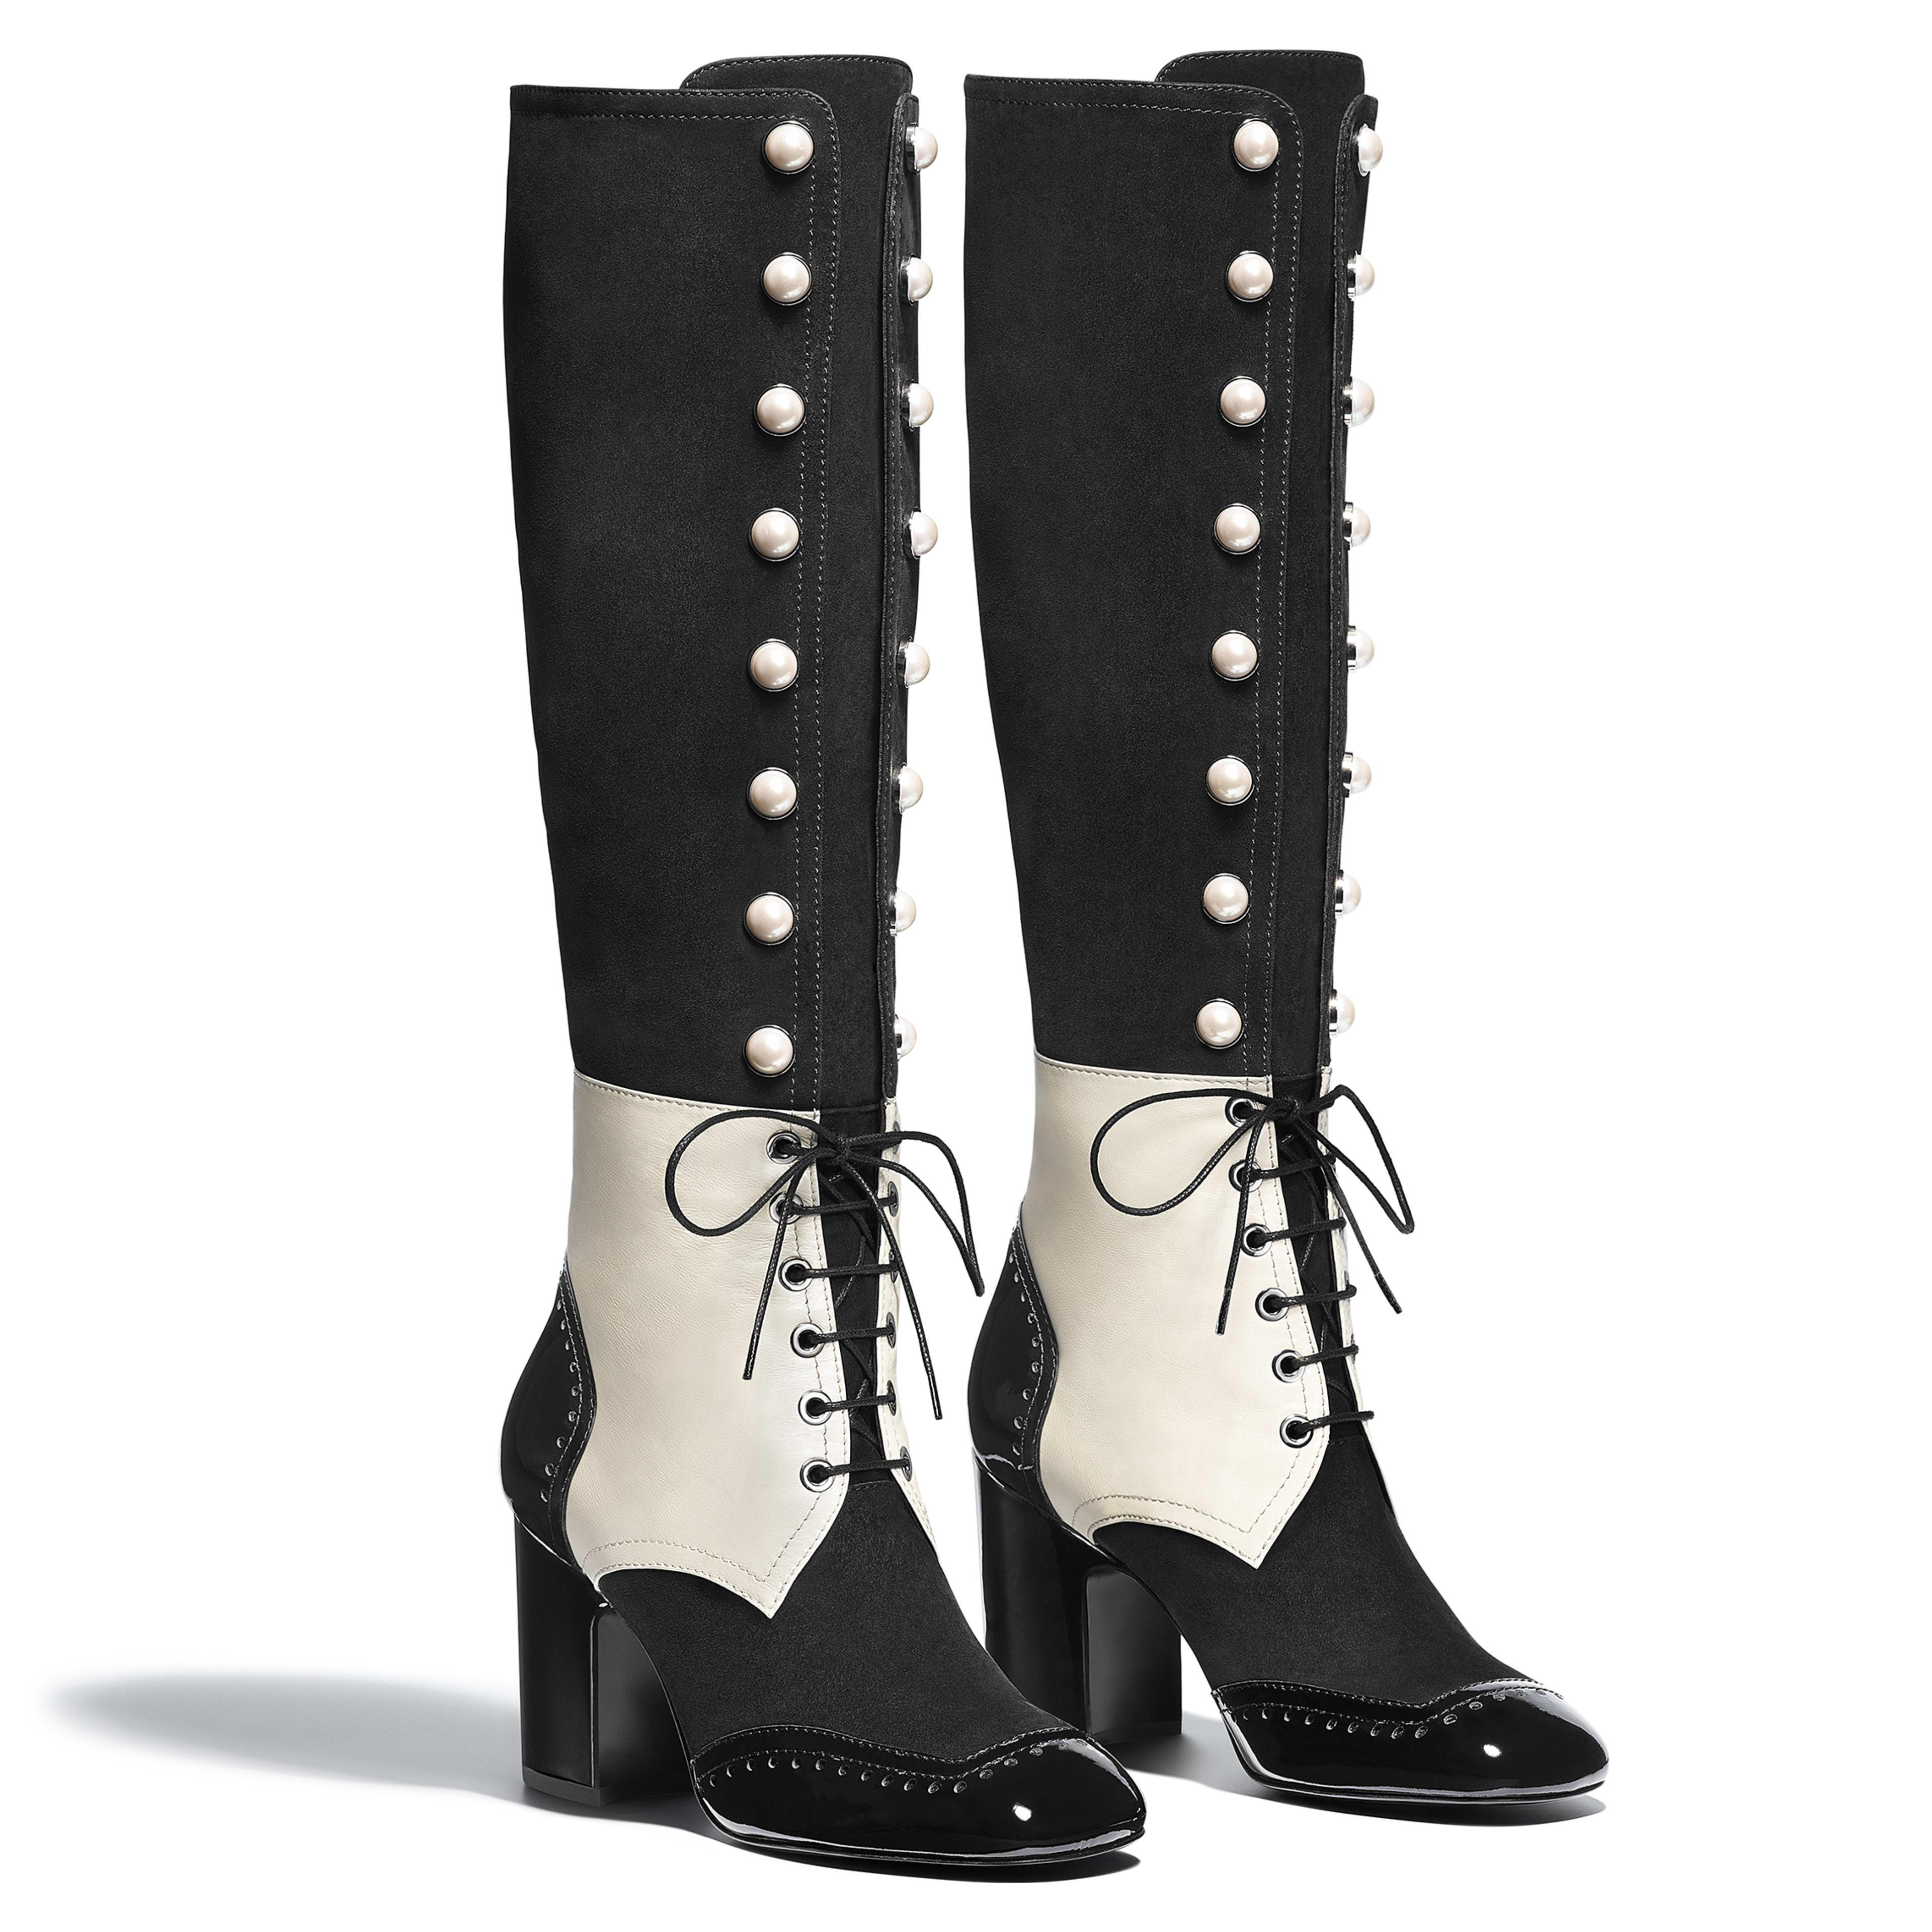 High Boots - Black & Ecru - Suede Goatskin, Lambskin & Patent Calfskin - Alternative view - see full sized version